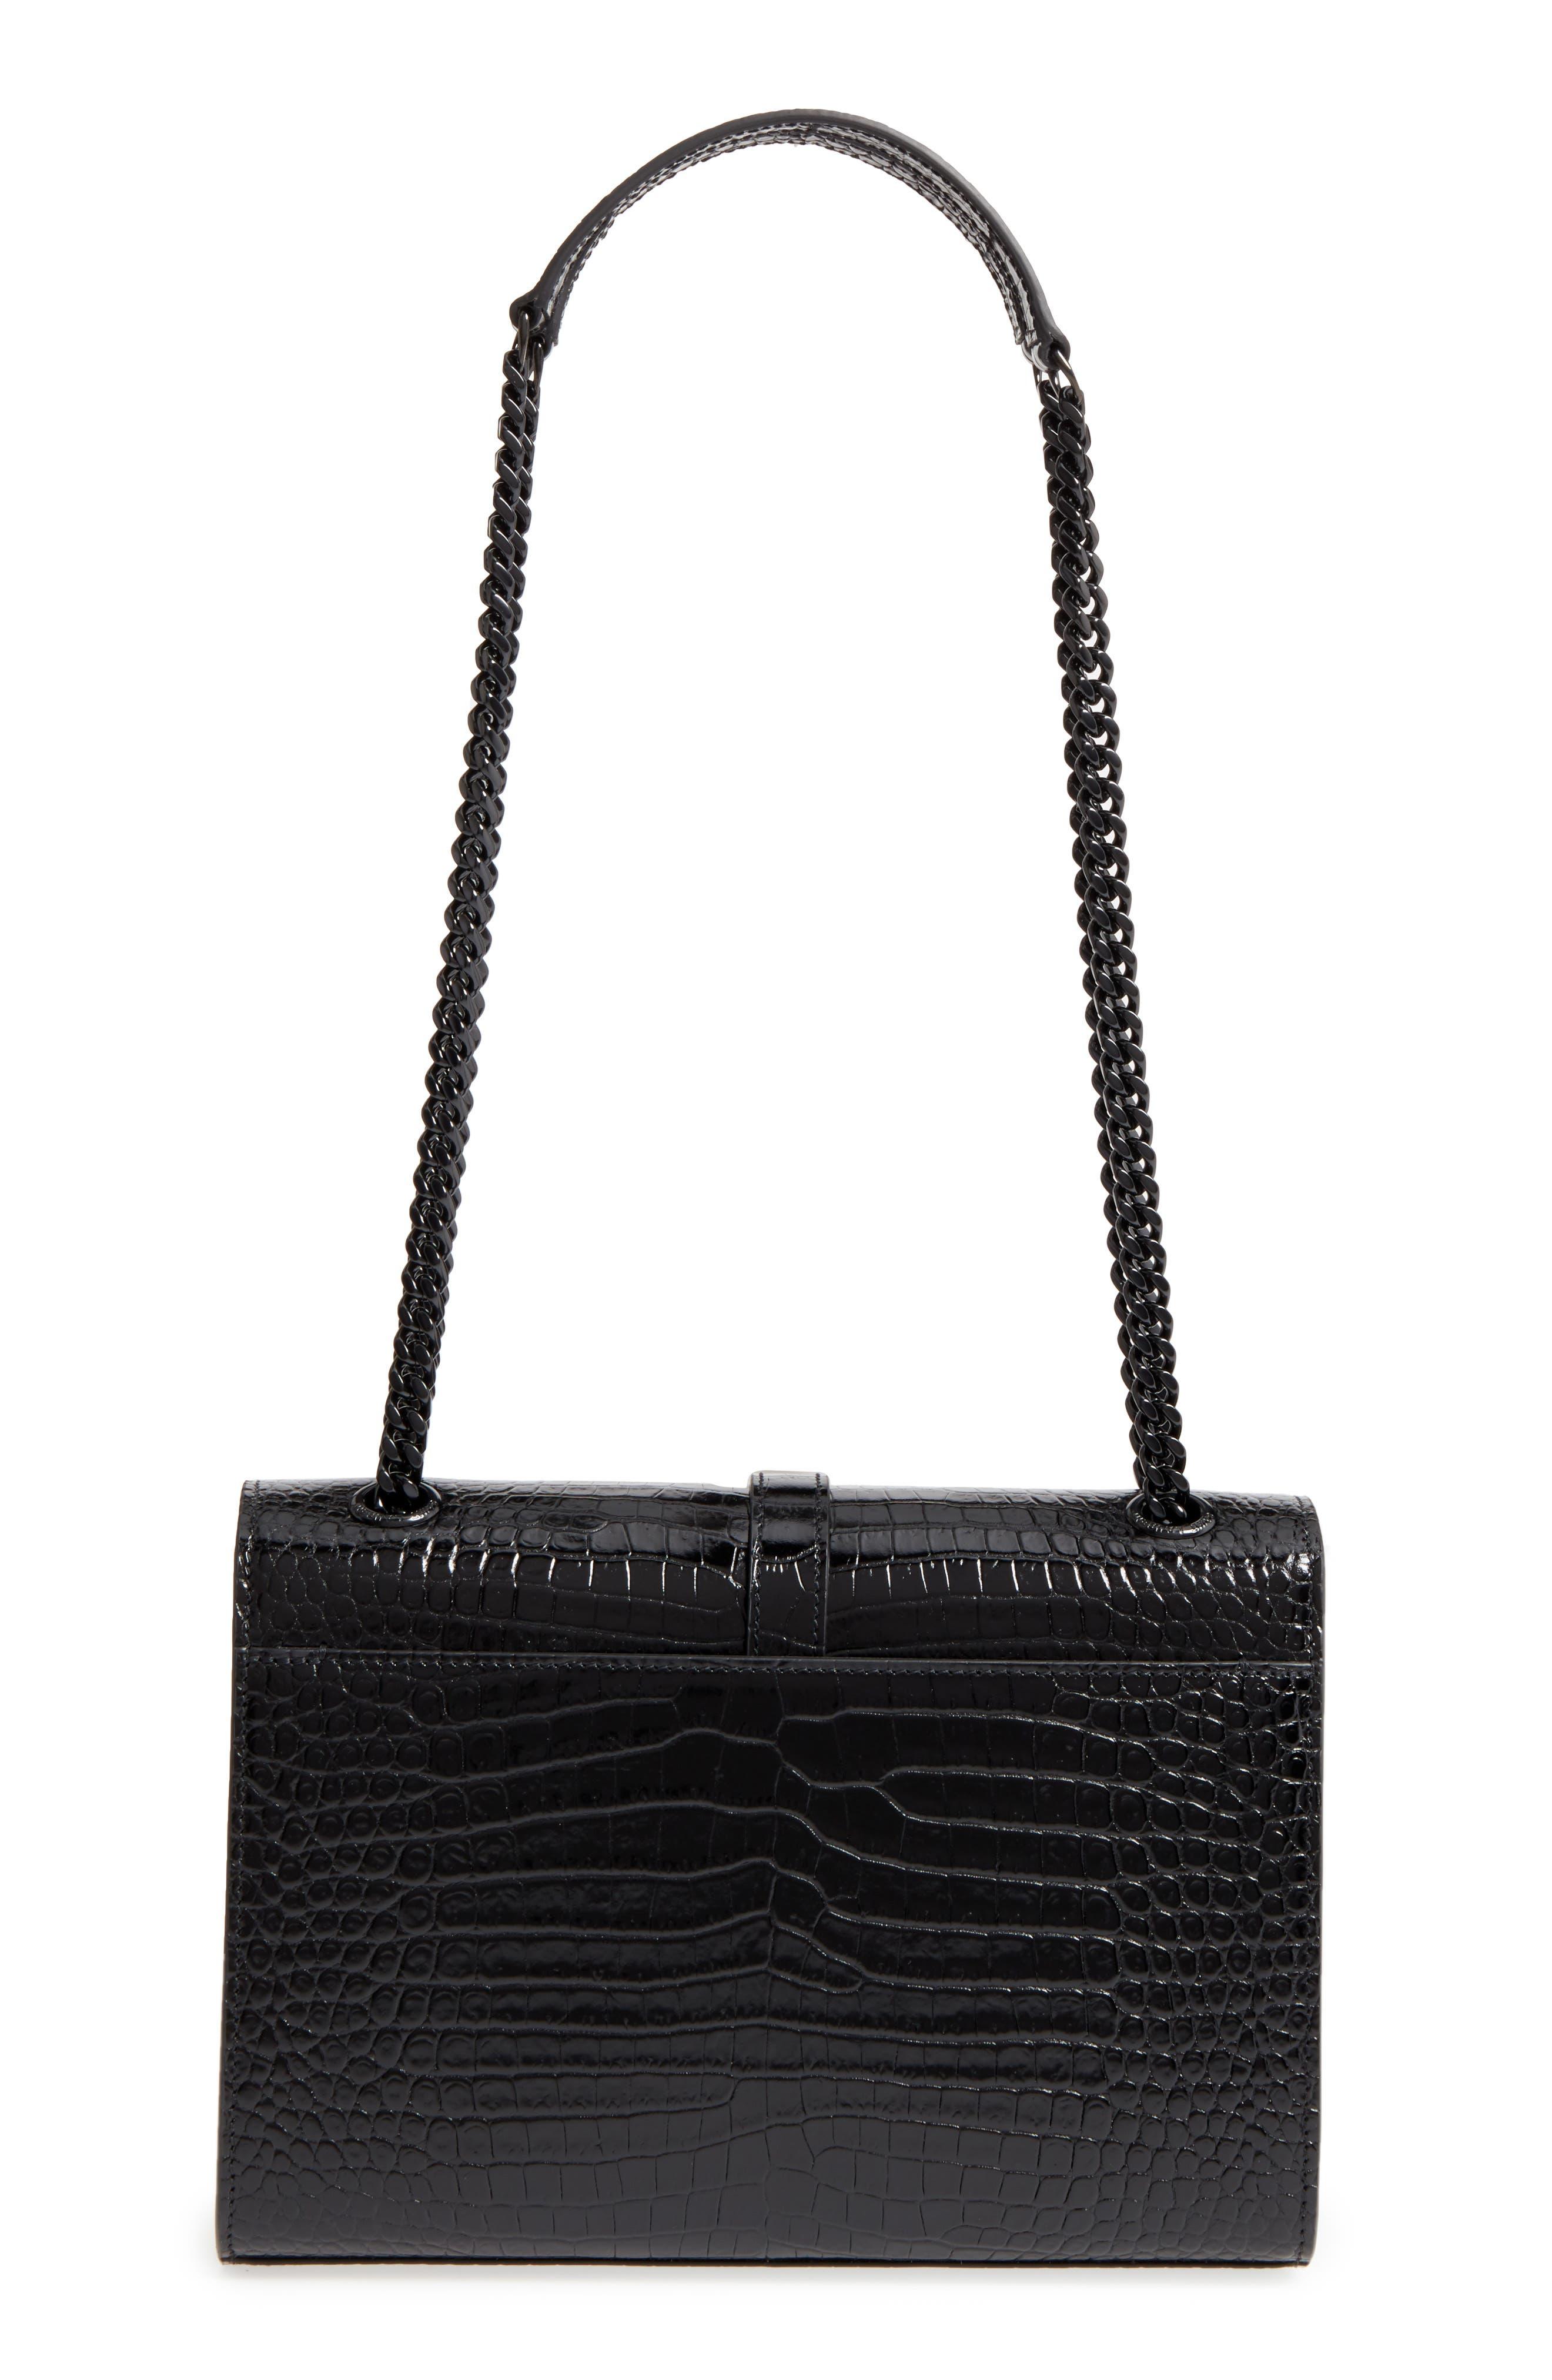 Medium Croc-Embossed Calfskin Shoulder Bag,                             Alternate thumbnail 3, color,                             Noir